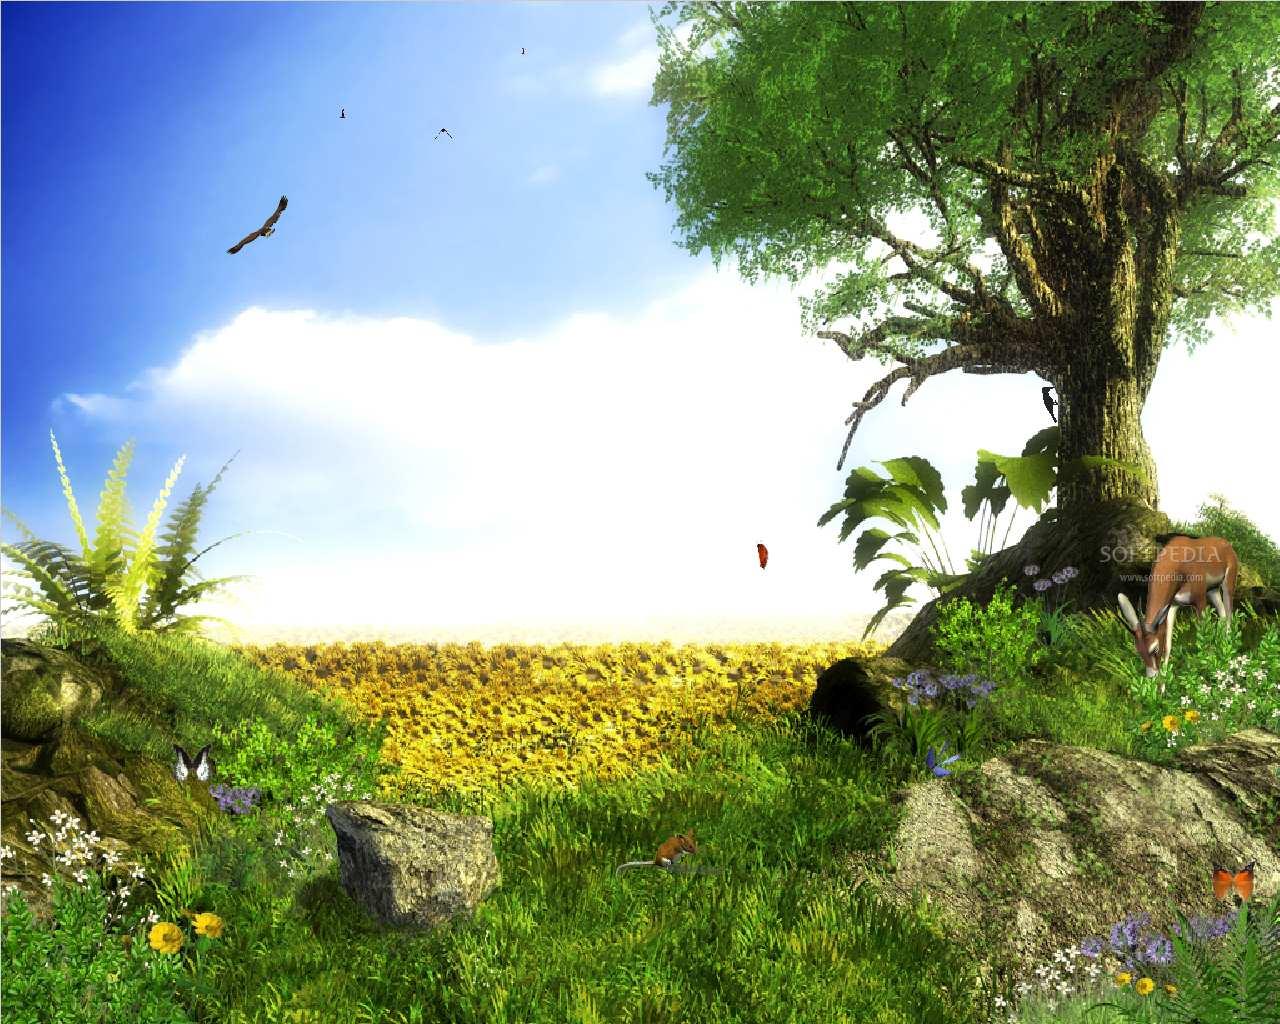 http://1.bp.blogspot.com/-e1EWXbRSJ20/Tu43Y9o9SdI/AAAAAAAABQ4/A5_l3XJwQ8I/s1600/animated%20desktop%20wallpapers3.jpg